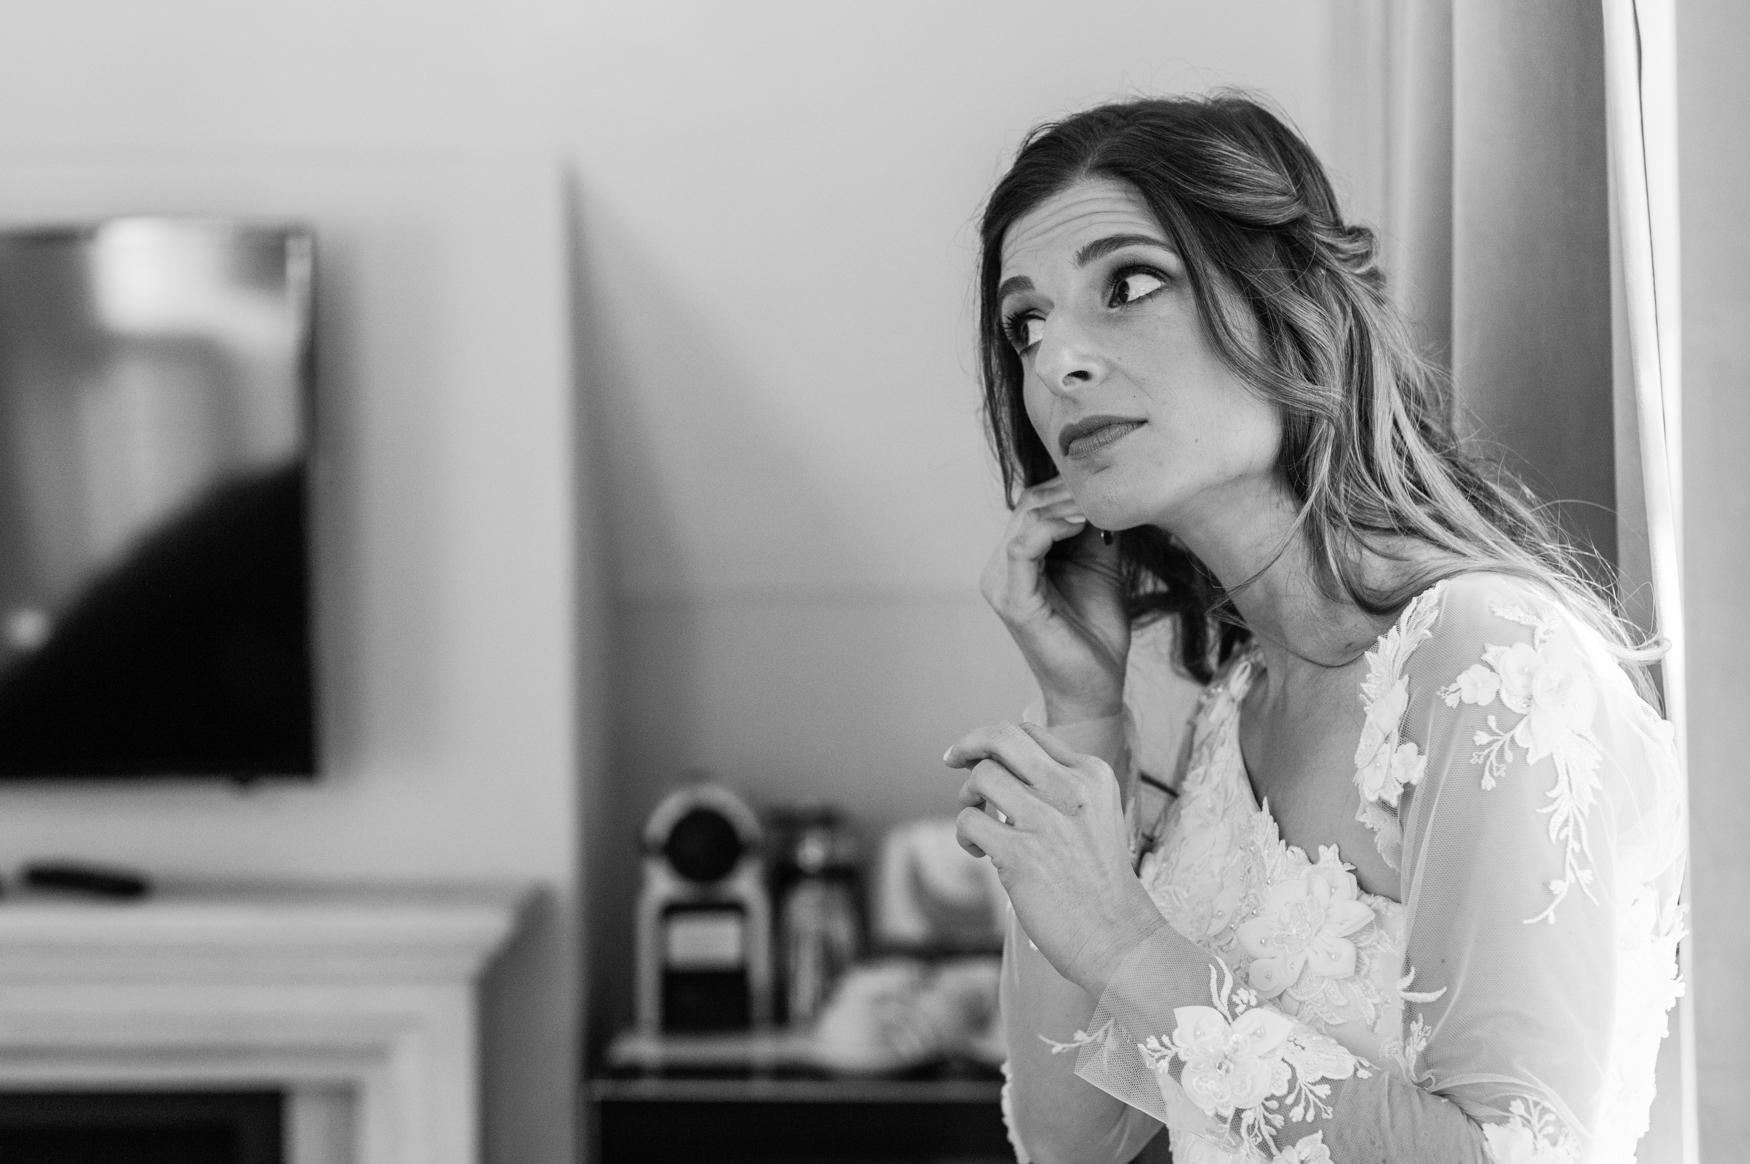 Leon_&_Martine's_Wedding_Photographs_17th_April_2019_@johnhenryweddingphoto_Low_Resolution_Web-135.JPG